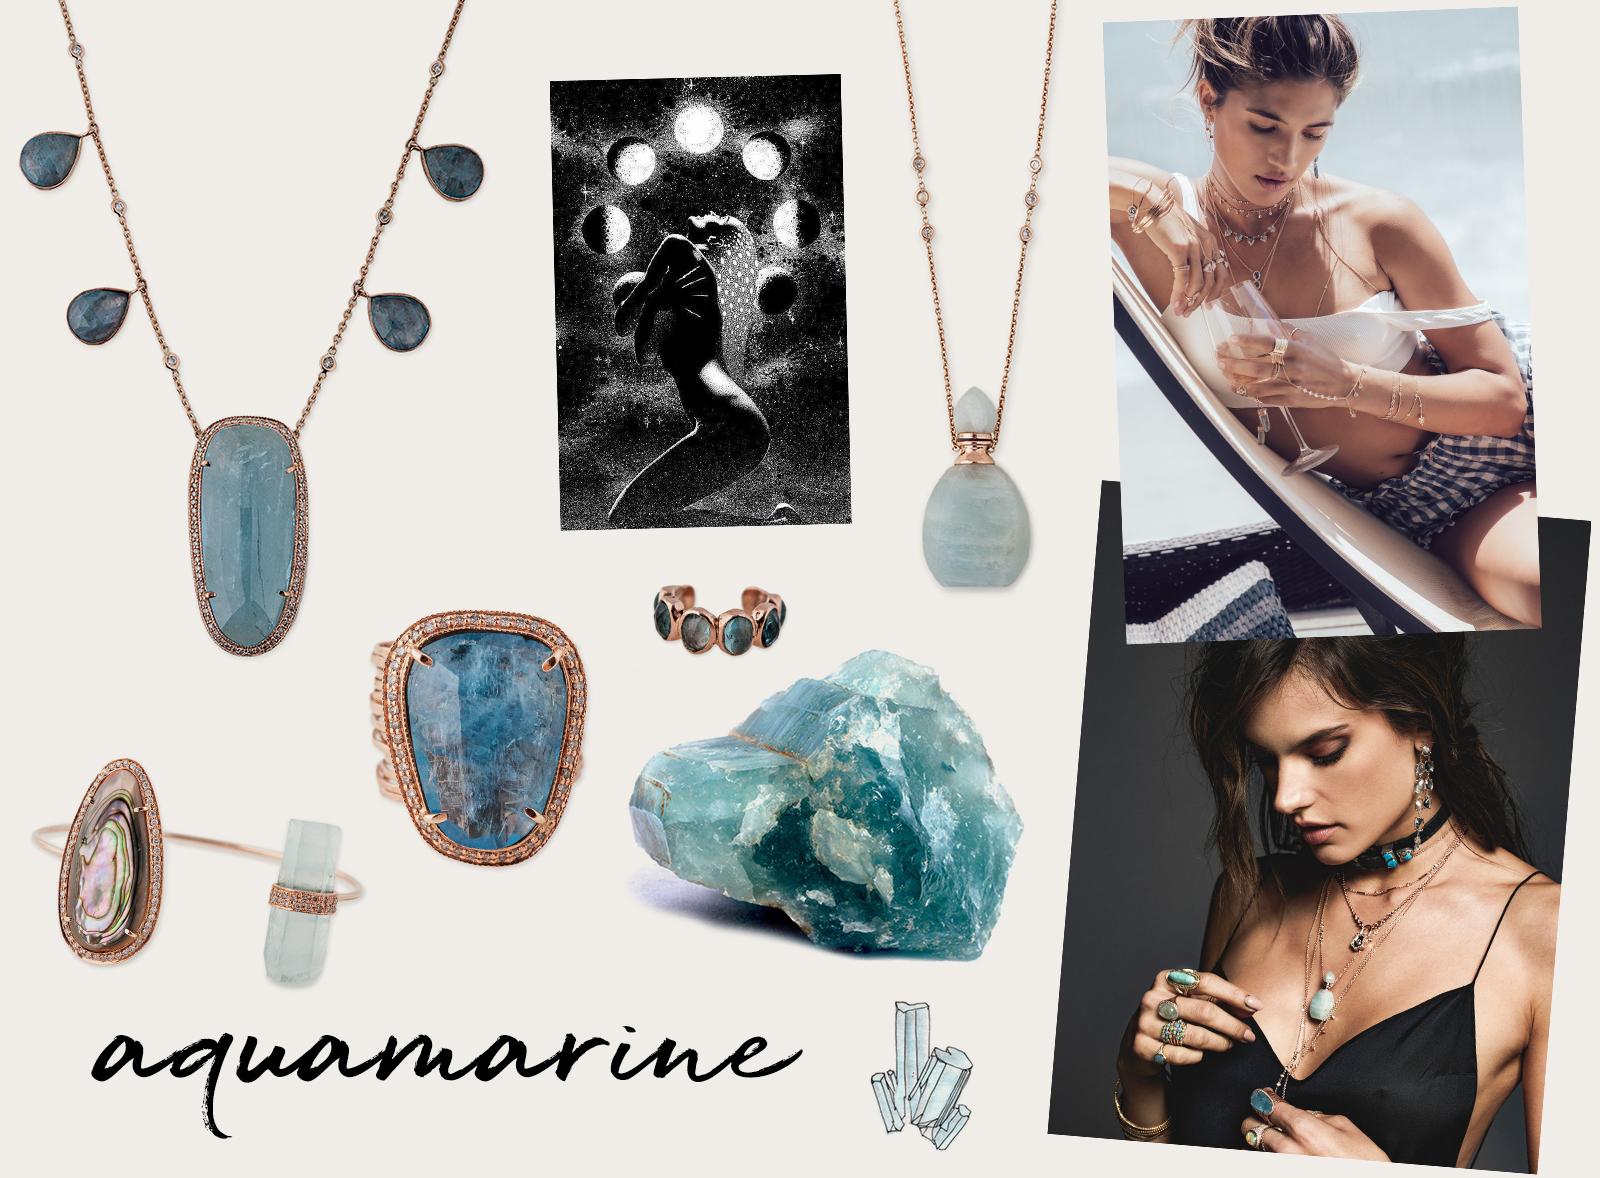 03-crystal-cravings-aquamarine.jpg